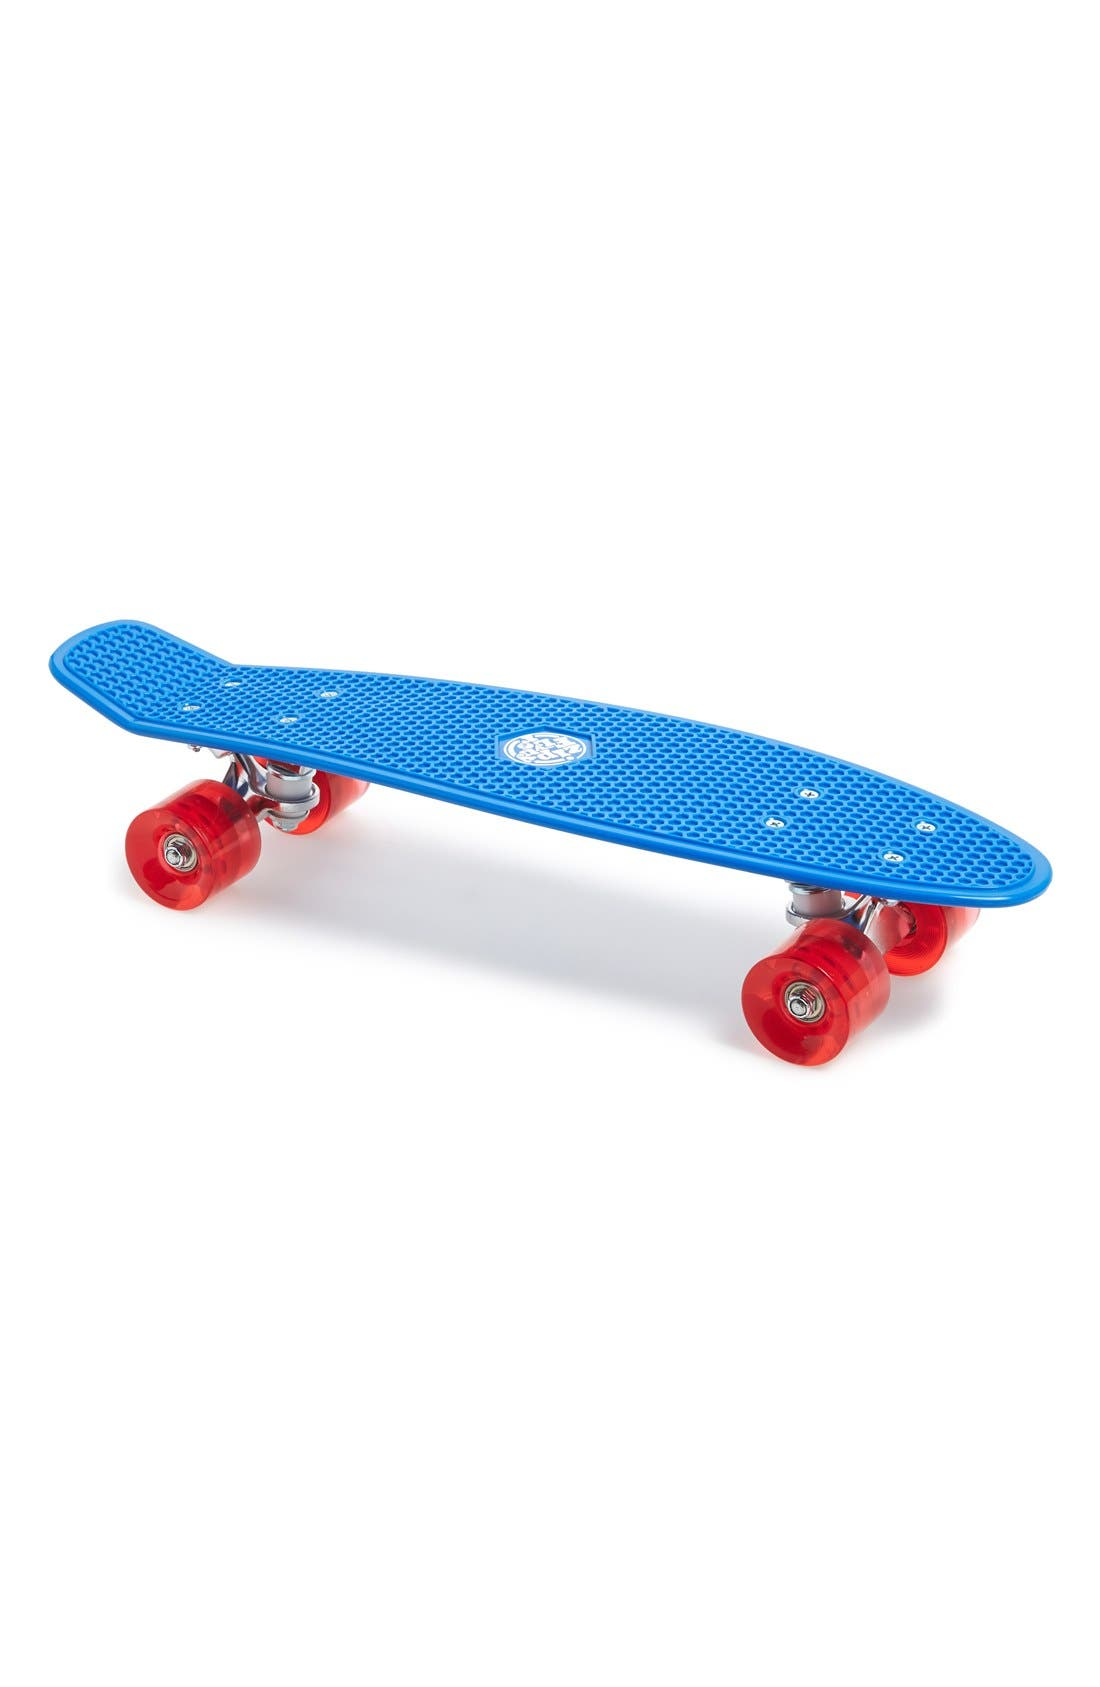 Alternate Image 1 Selected - Zippy Flyer Skateboard